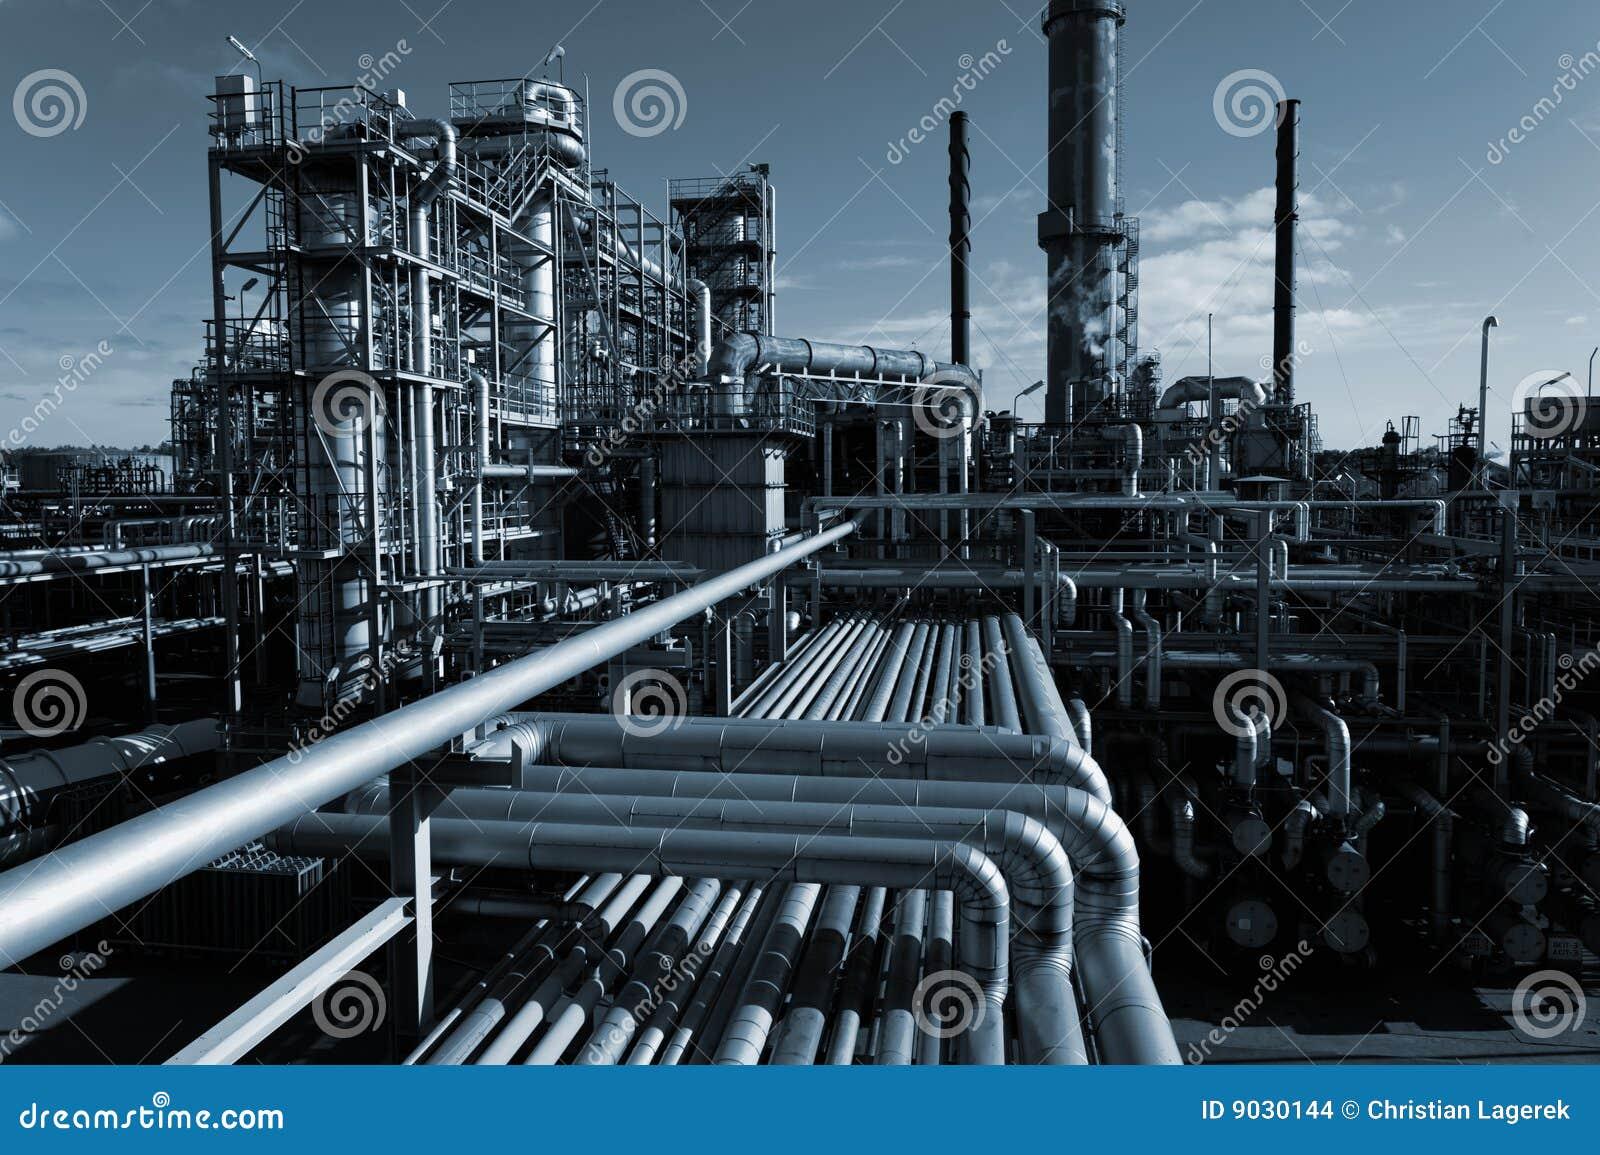 industry stock: